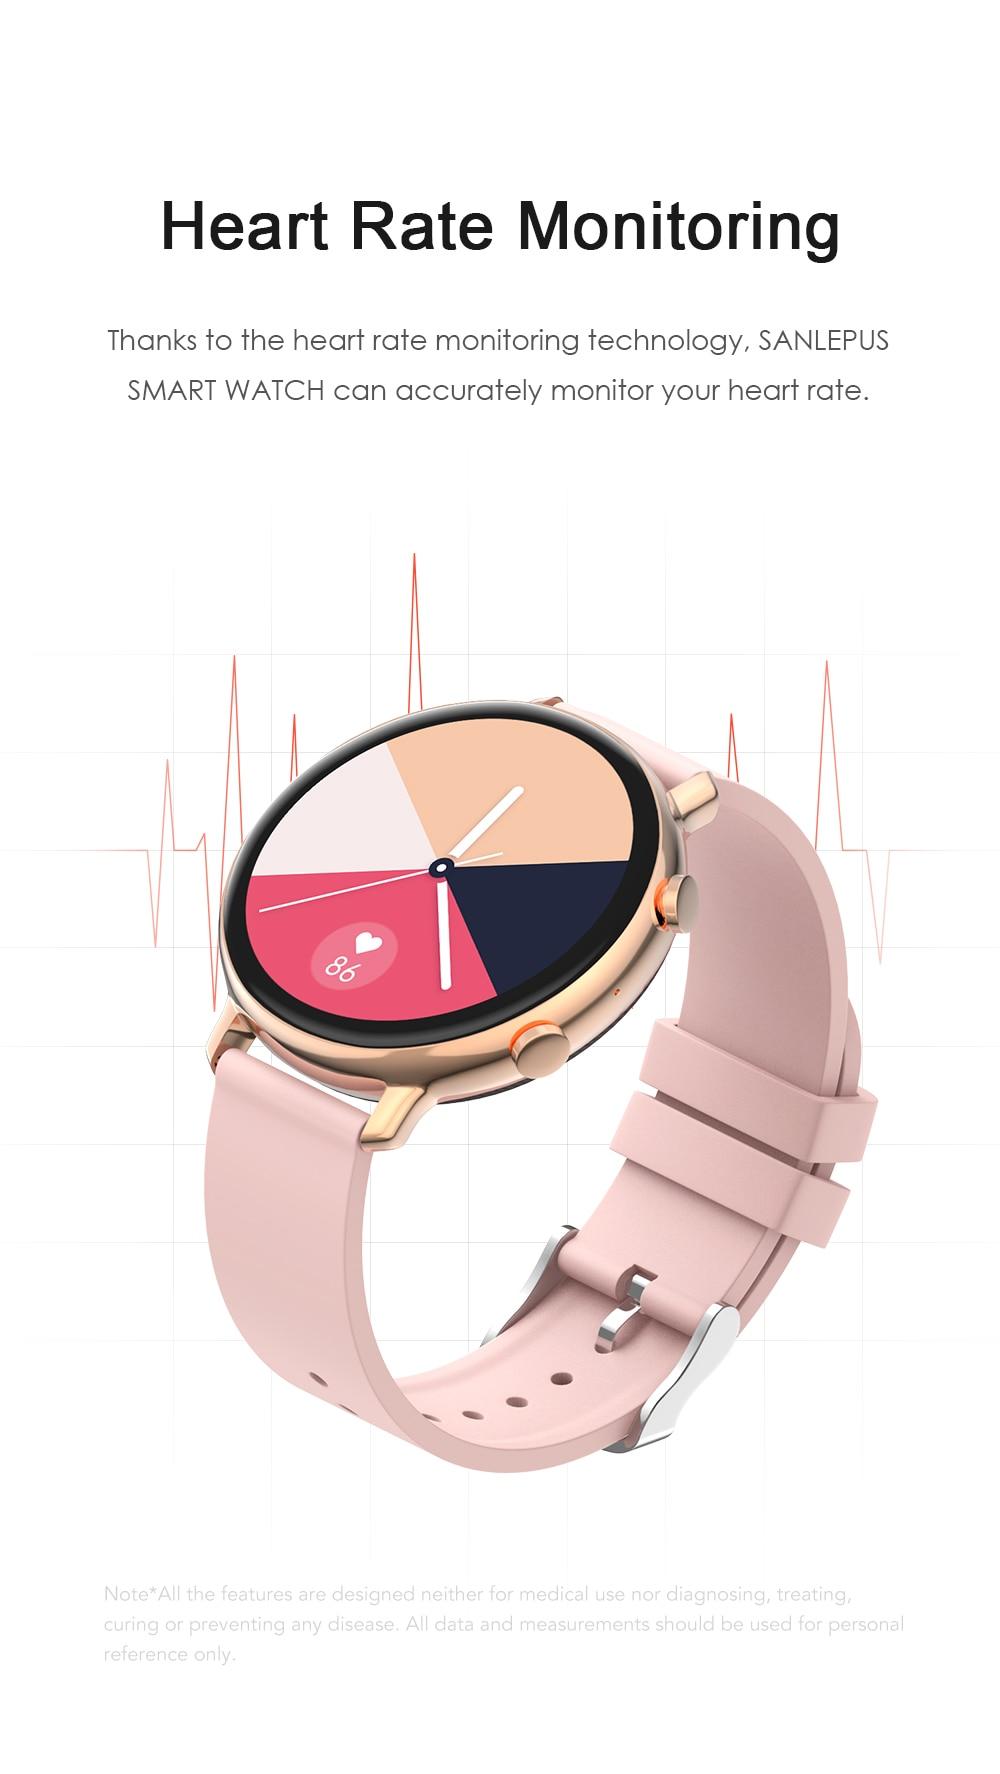 Head20fe7e869409dbfa6bf2d08a629271 SANLEPUS 2021 Smart Watch Dial Calls Men Women Waterproof Smartwatch ECG PPG Fitness Bracelet Band For Android Apple Xiaomi